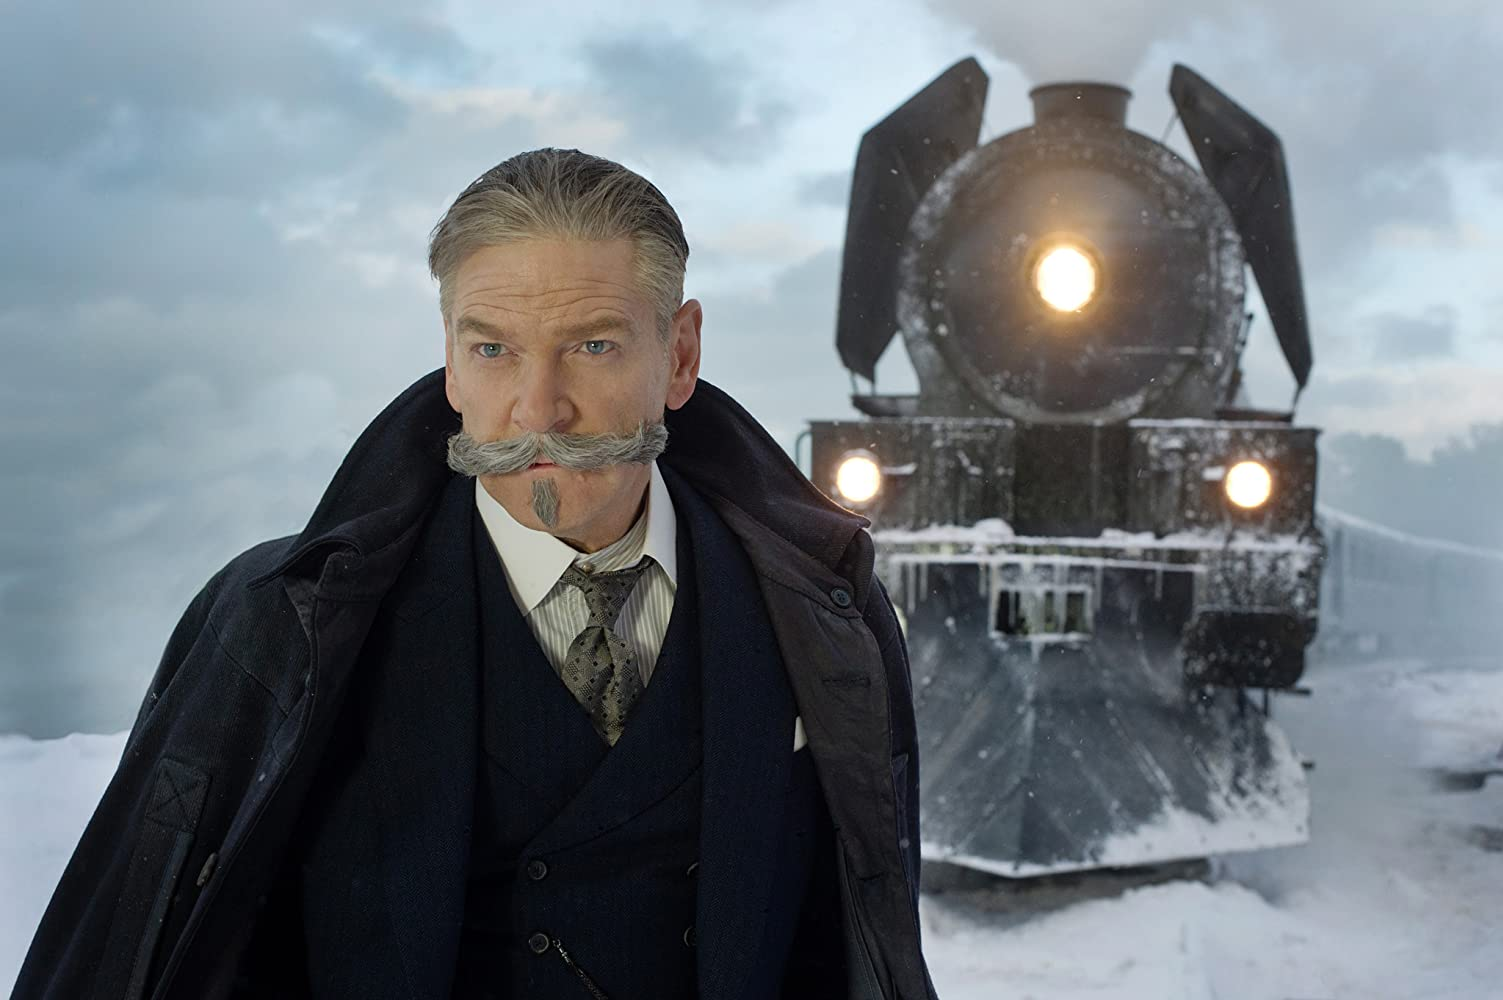 Kenneth Branagh in Murder on the Orient Express (2017)